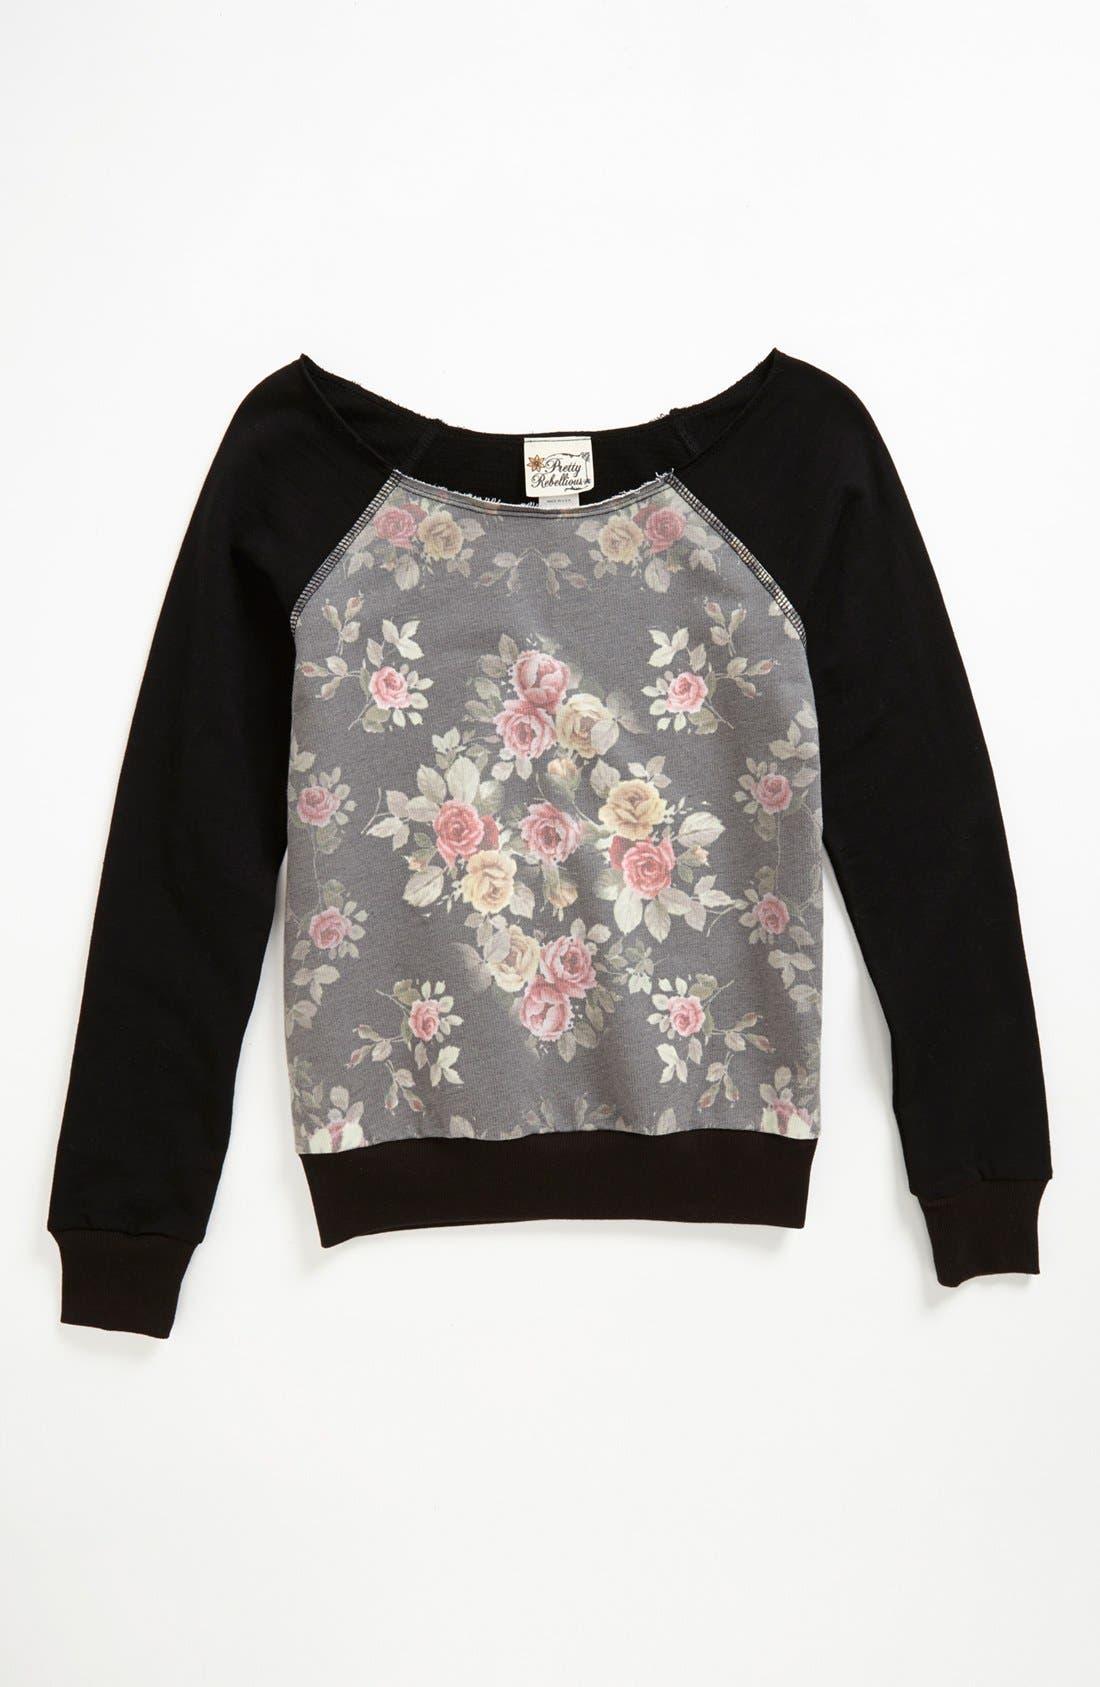 Alternate Image 1 Selected - Pretty Rebellious Floral Inset Sweatshirt (Big Girls)